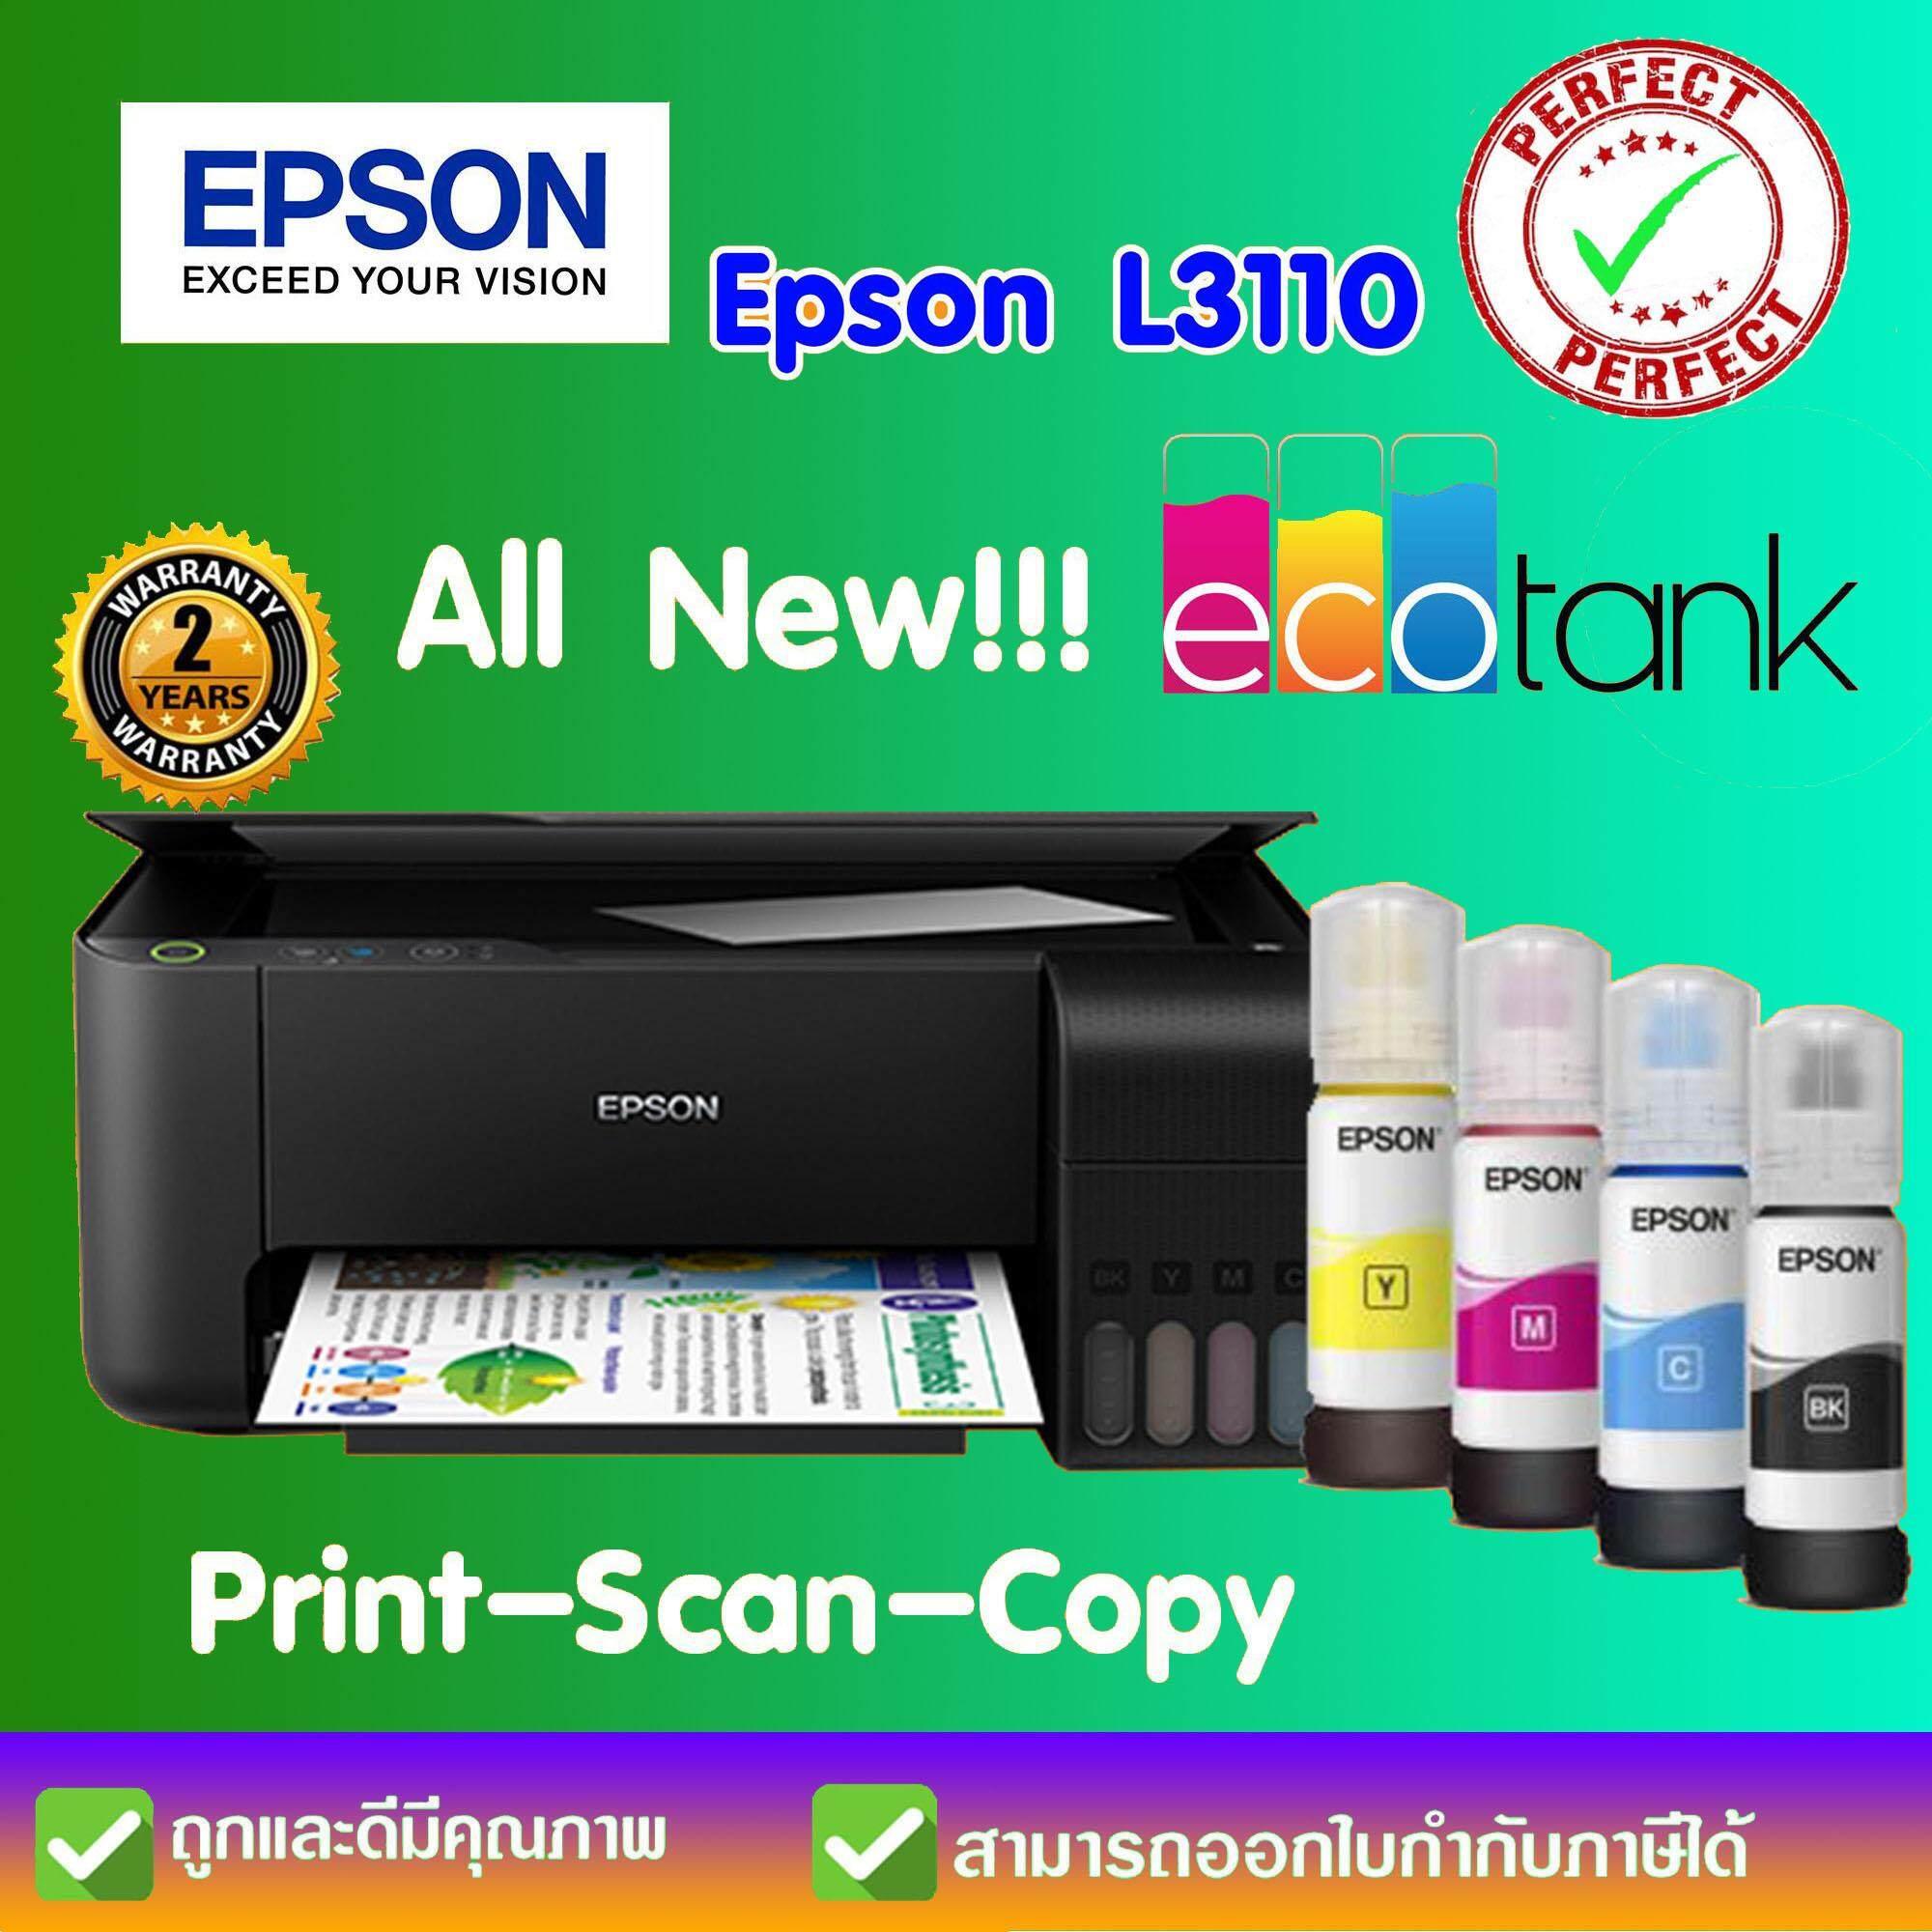 Epson EcoTank L3110 All-in-One Ink Tank Printer(ฟรีหมึกแท้ 1 ชุด)